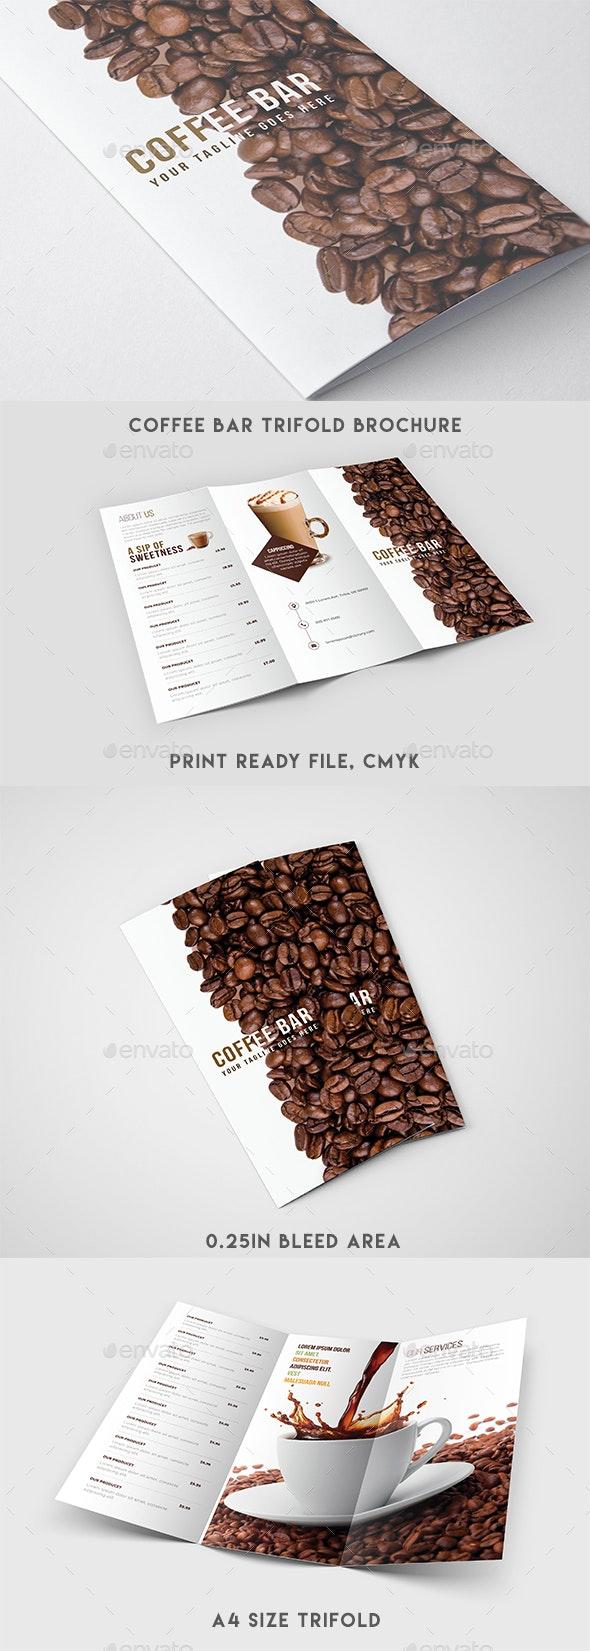 Trifold Brochure - Coffee Menu - Brochures Print Templates